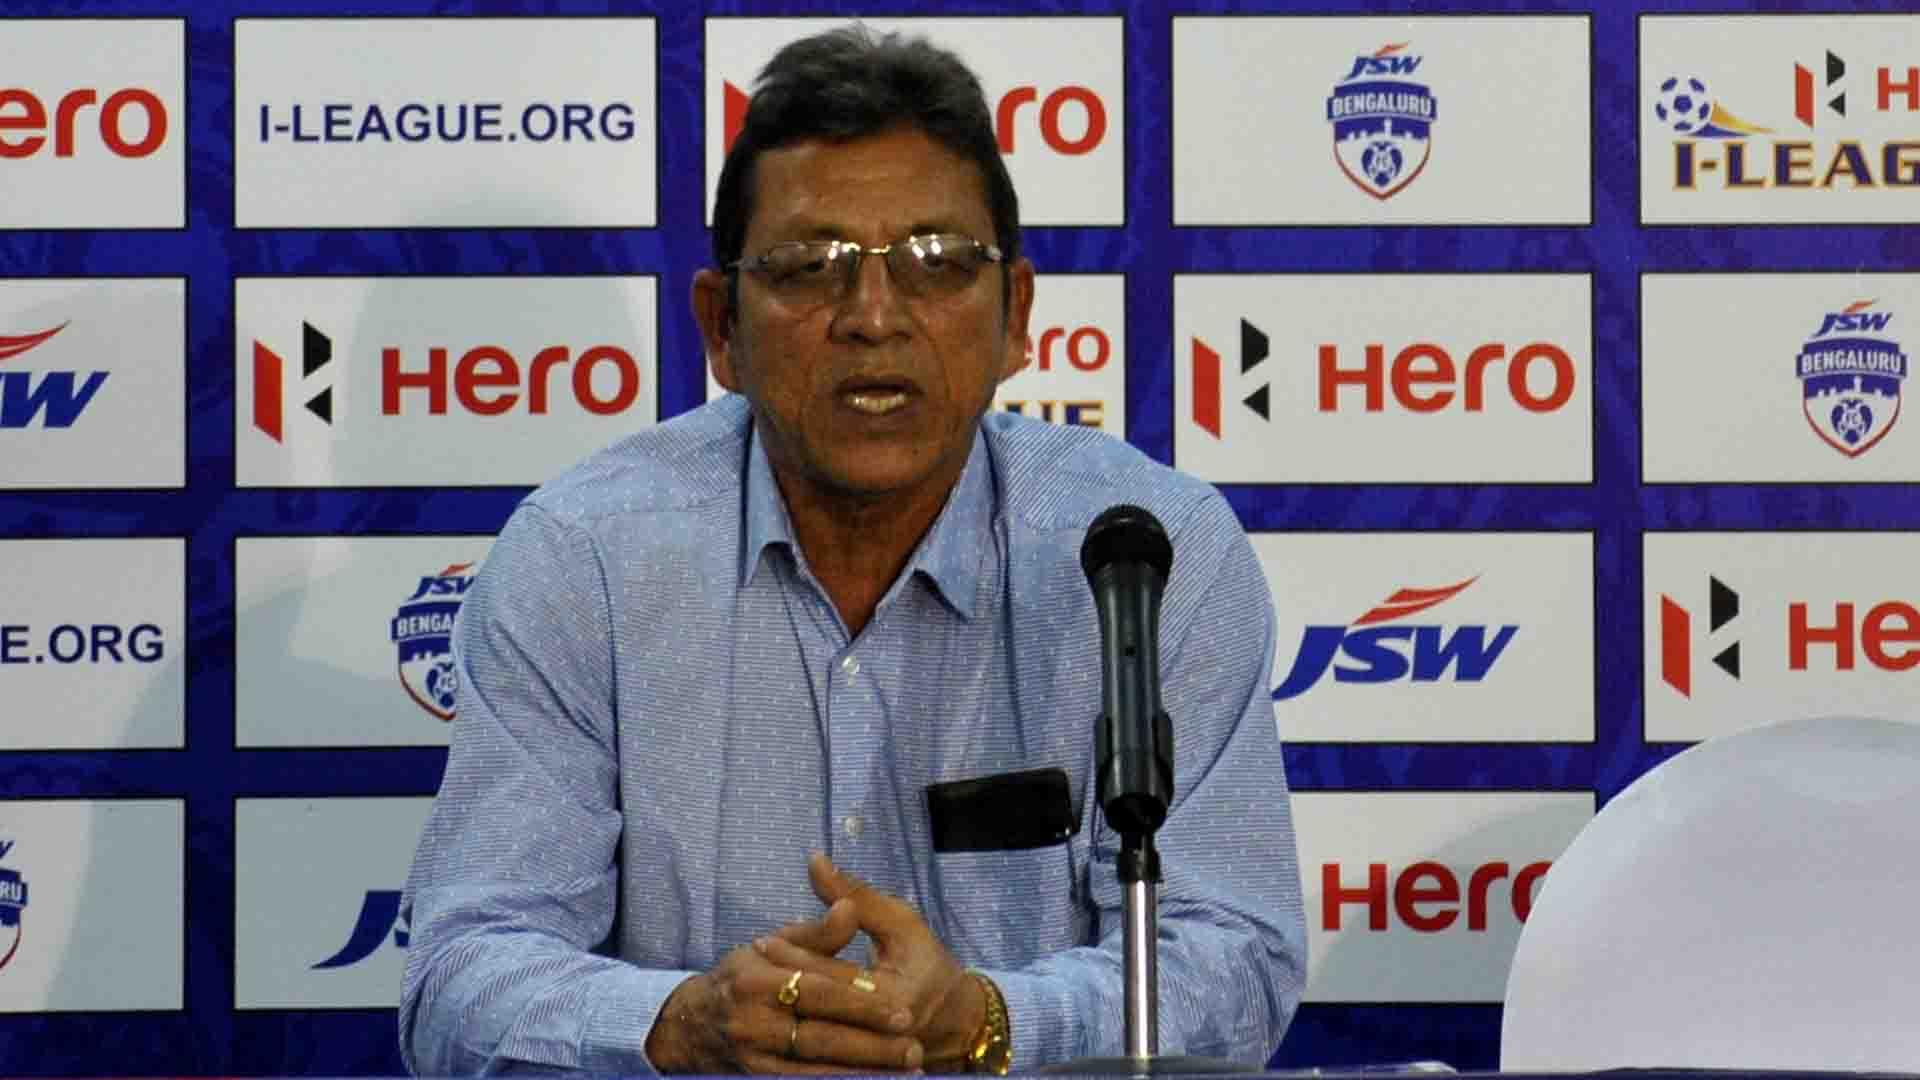 I-League: Mohun Bagan's Sanjoy Sen - We aren't over confident